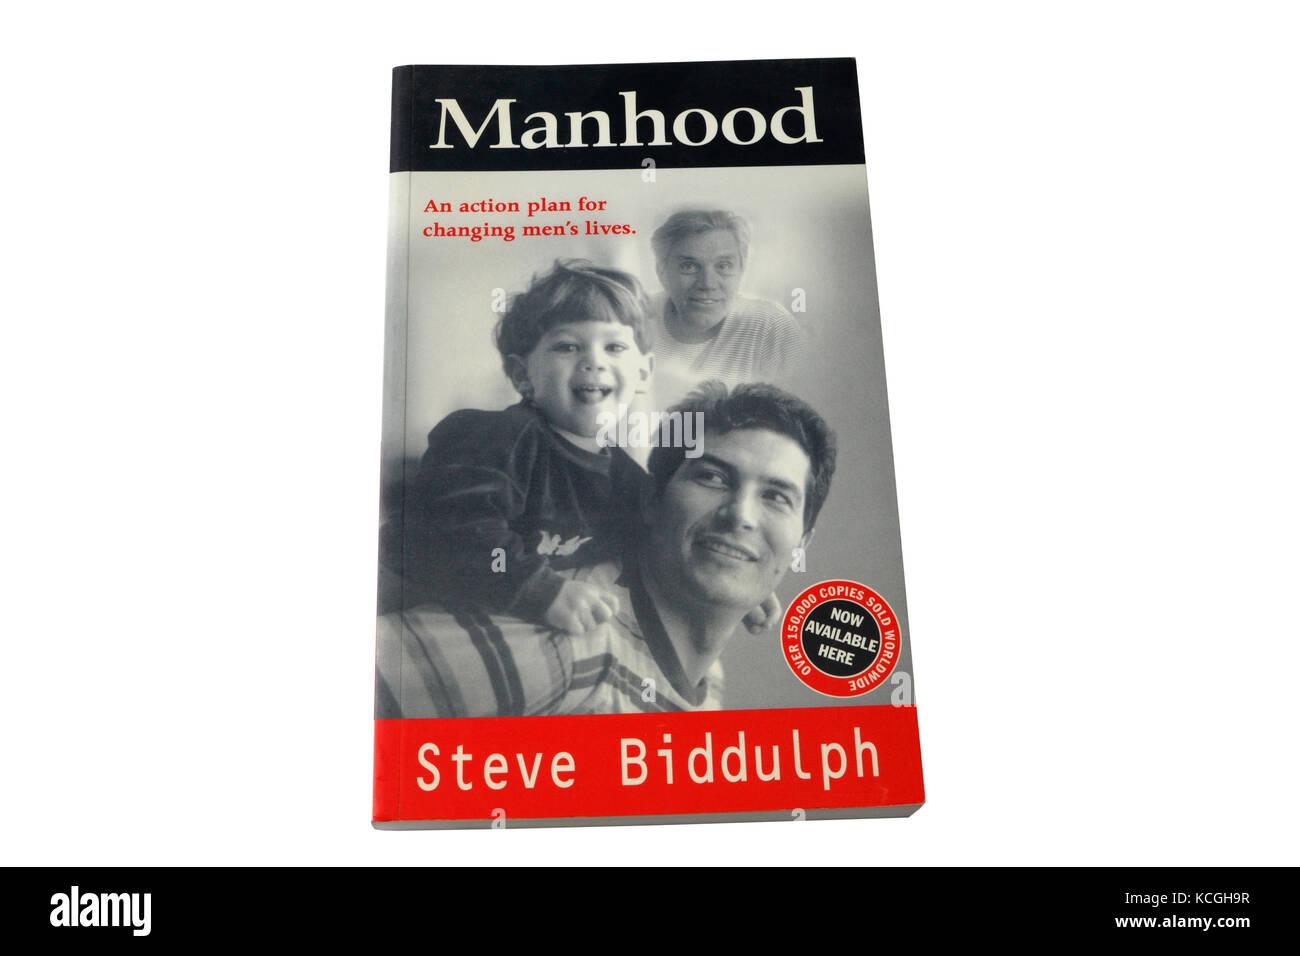 Manhood by Steve Biddulph, Book cover - Stock Image